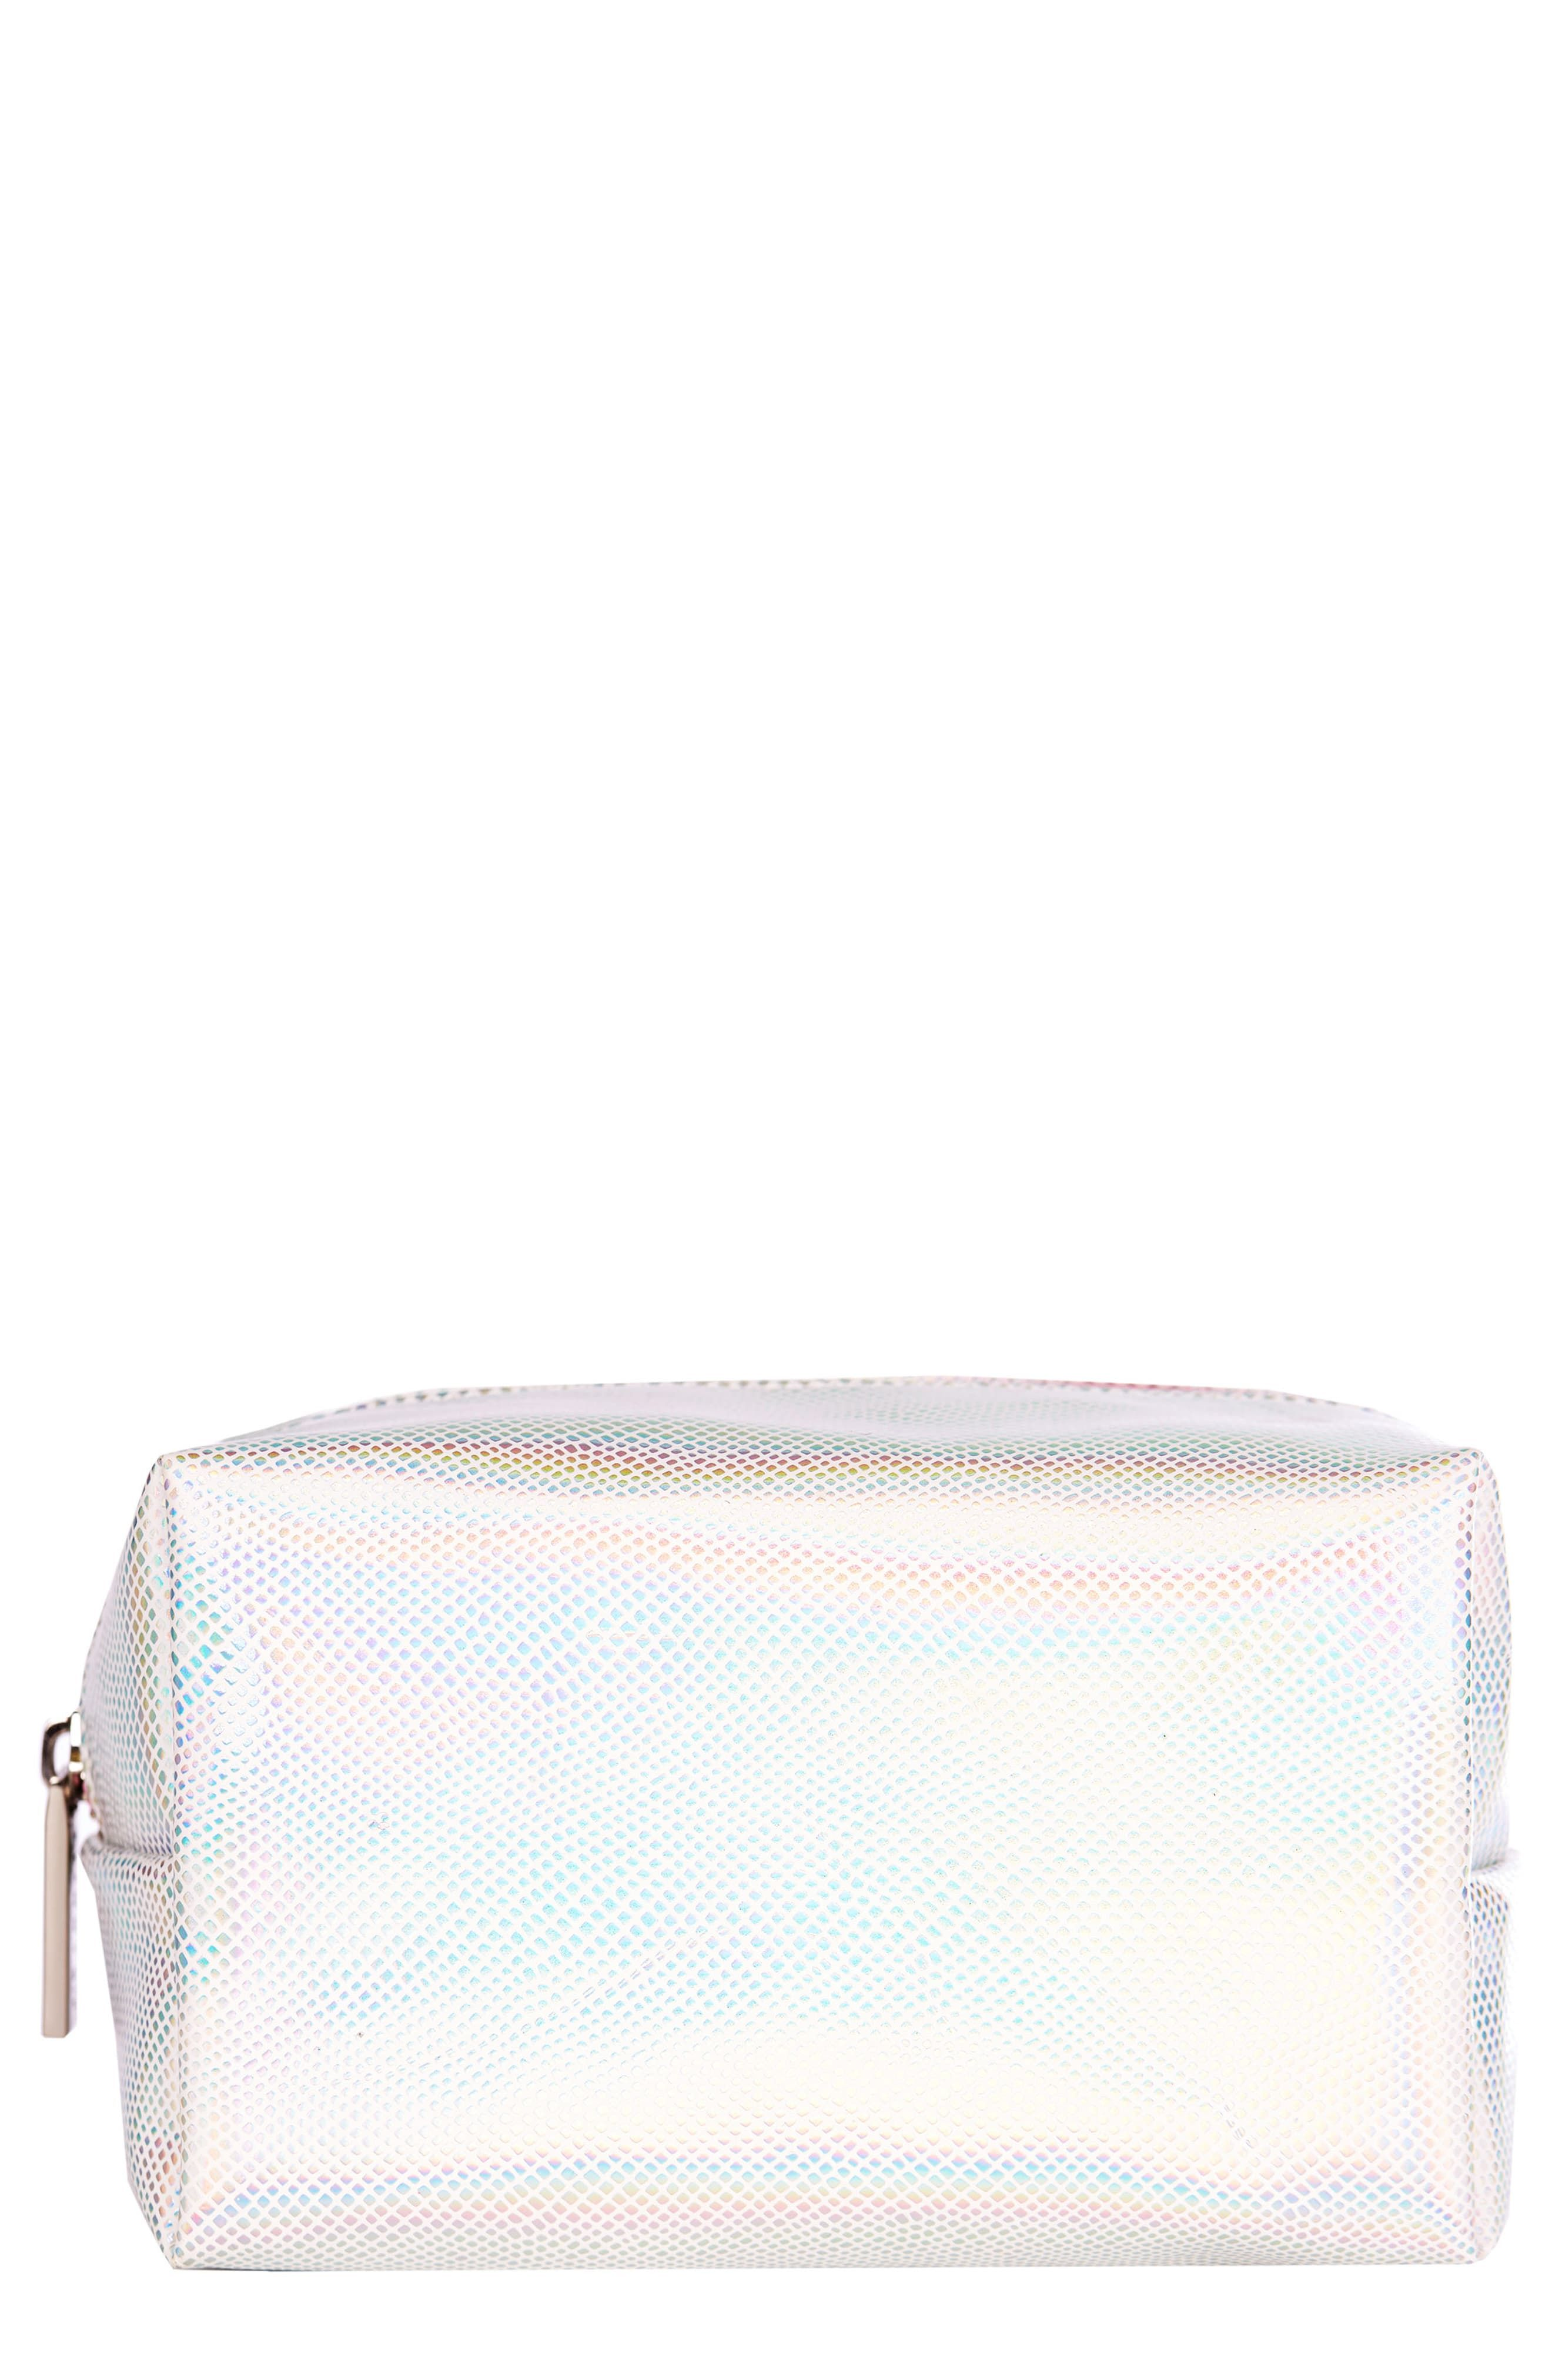 Skinnydip Holo Makeup Bag Bags, Cosmetic case, Zip